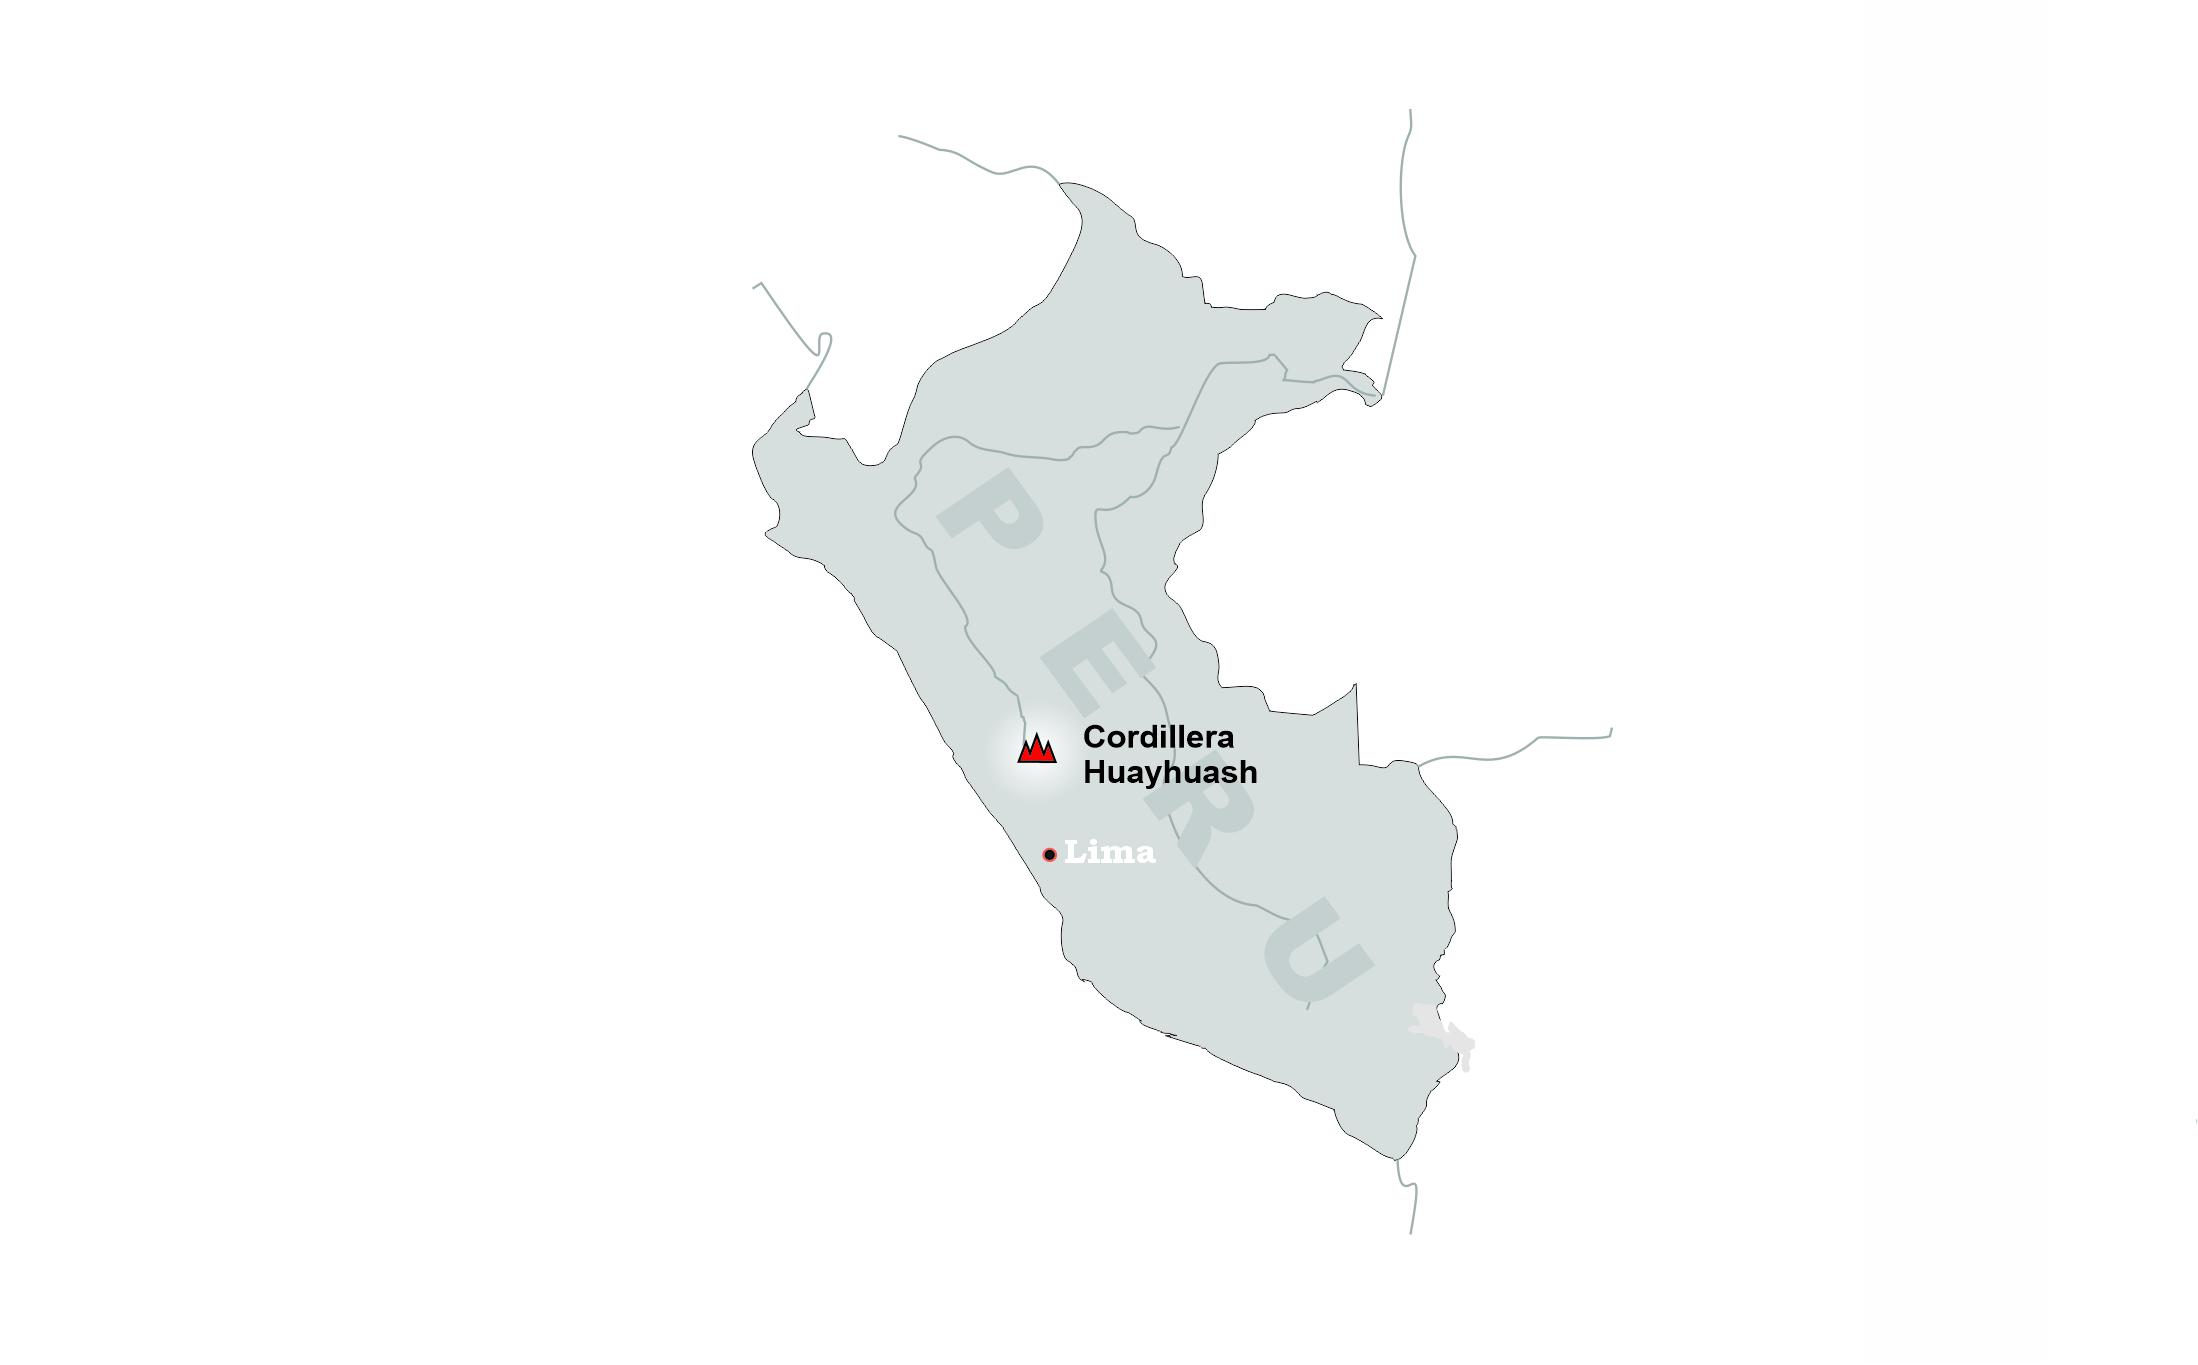 https://akilpohuaraz.com/wp-content/uploads/2020/12/location-of-cordillera-huayhuash.jpg